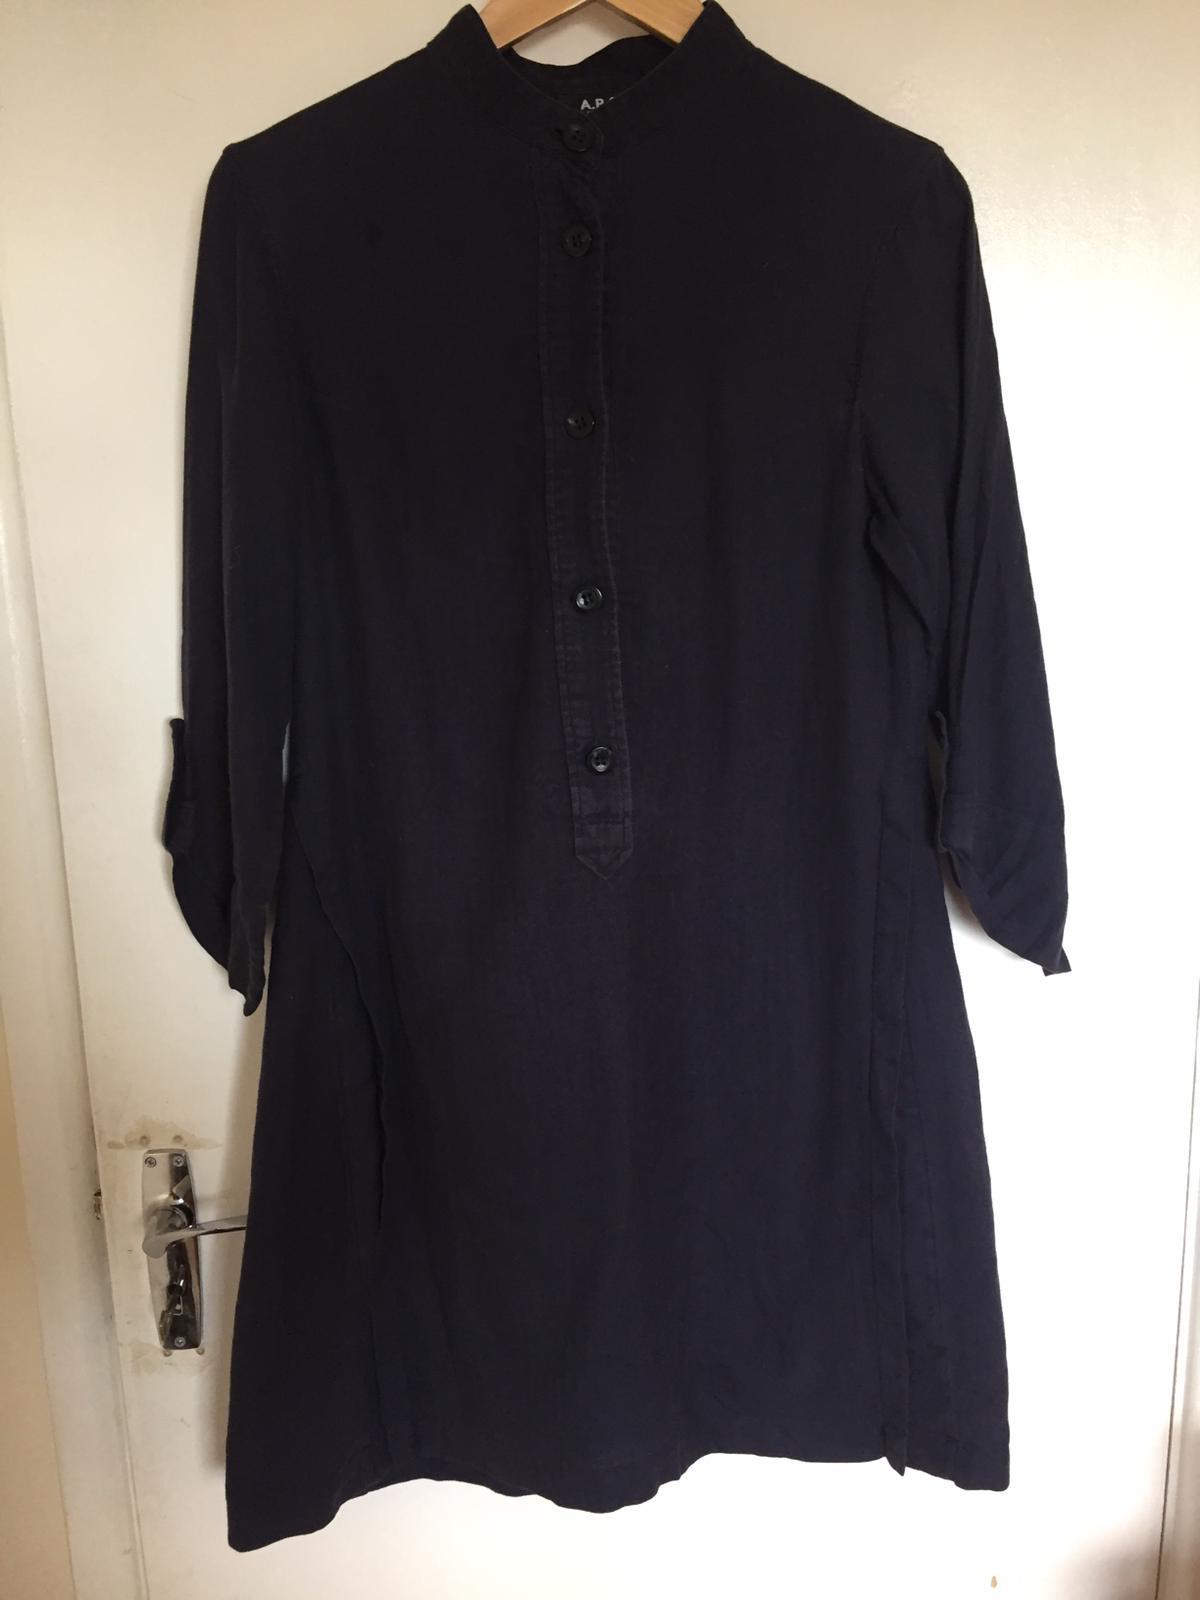 Image of APC Cotton dress